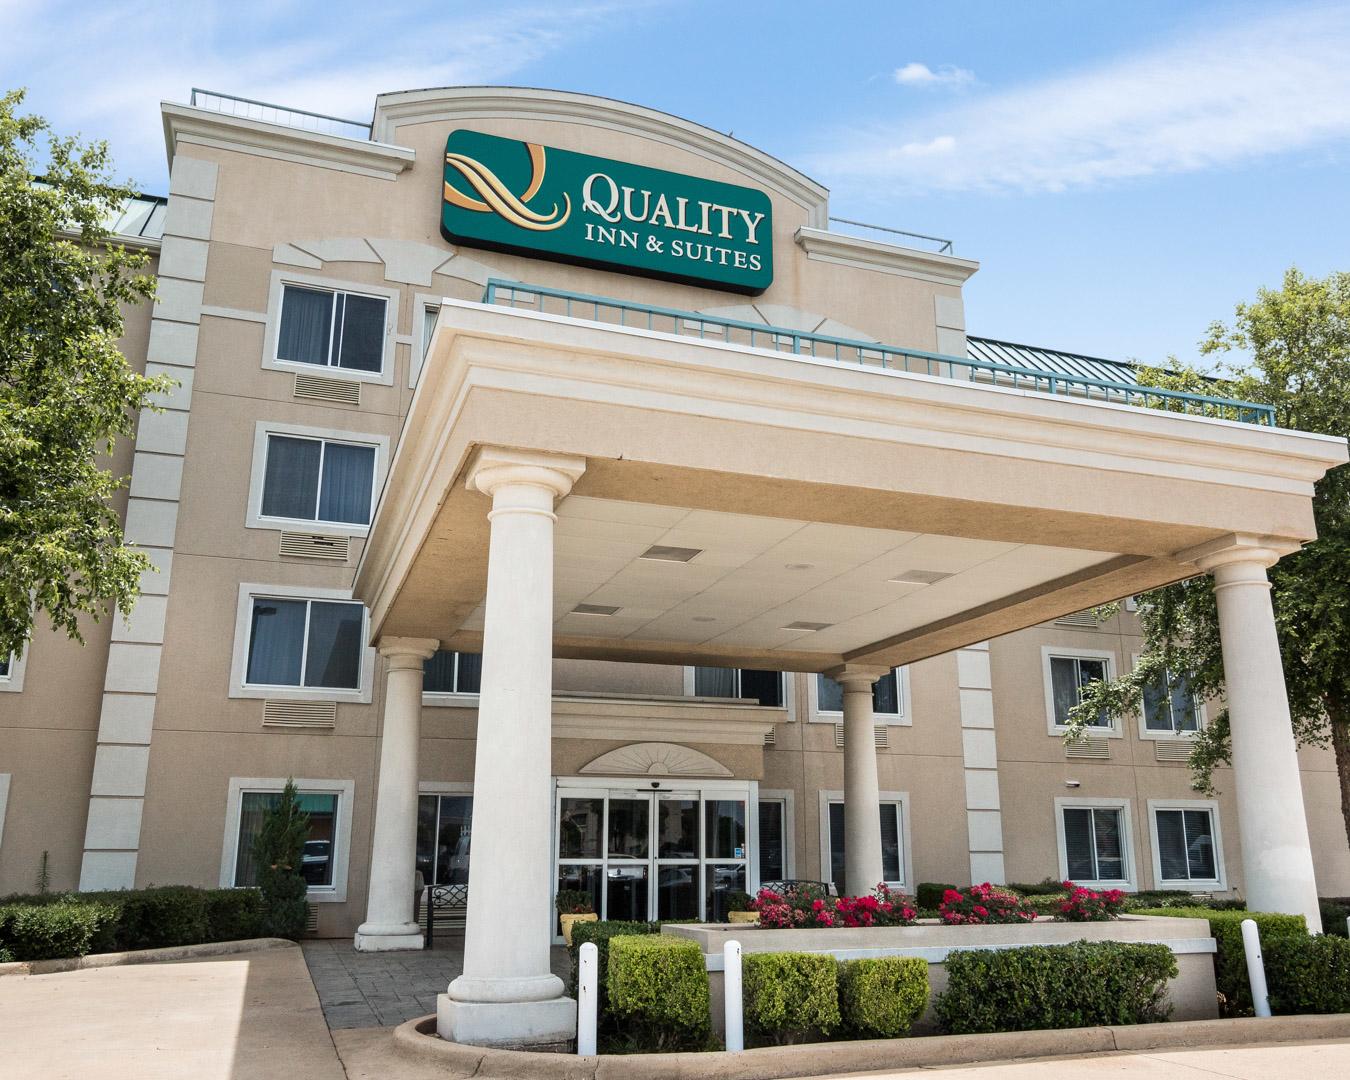 Quality Inn Suites Hotel Bossier City La 71112 Hotel Near Me Best Hotel Near Me [hotel-italia.us]